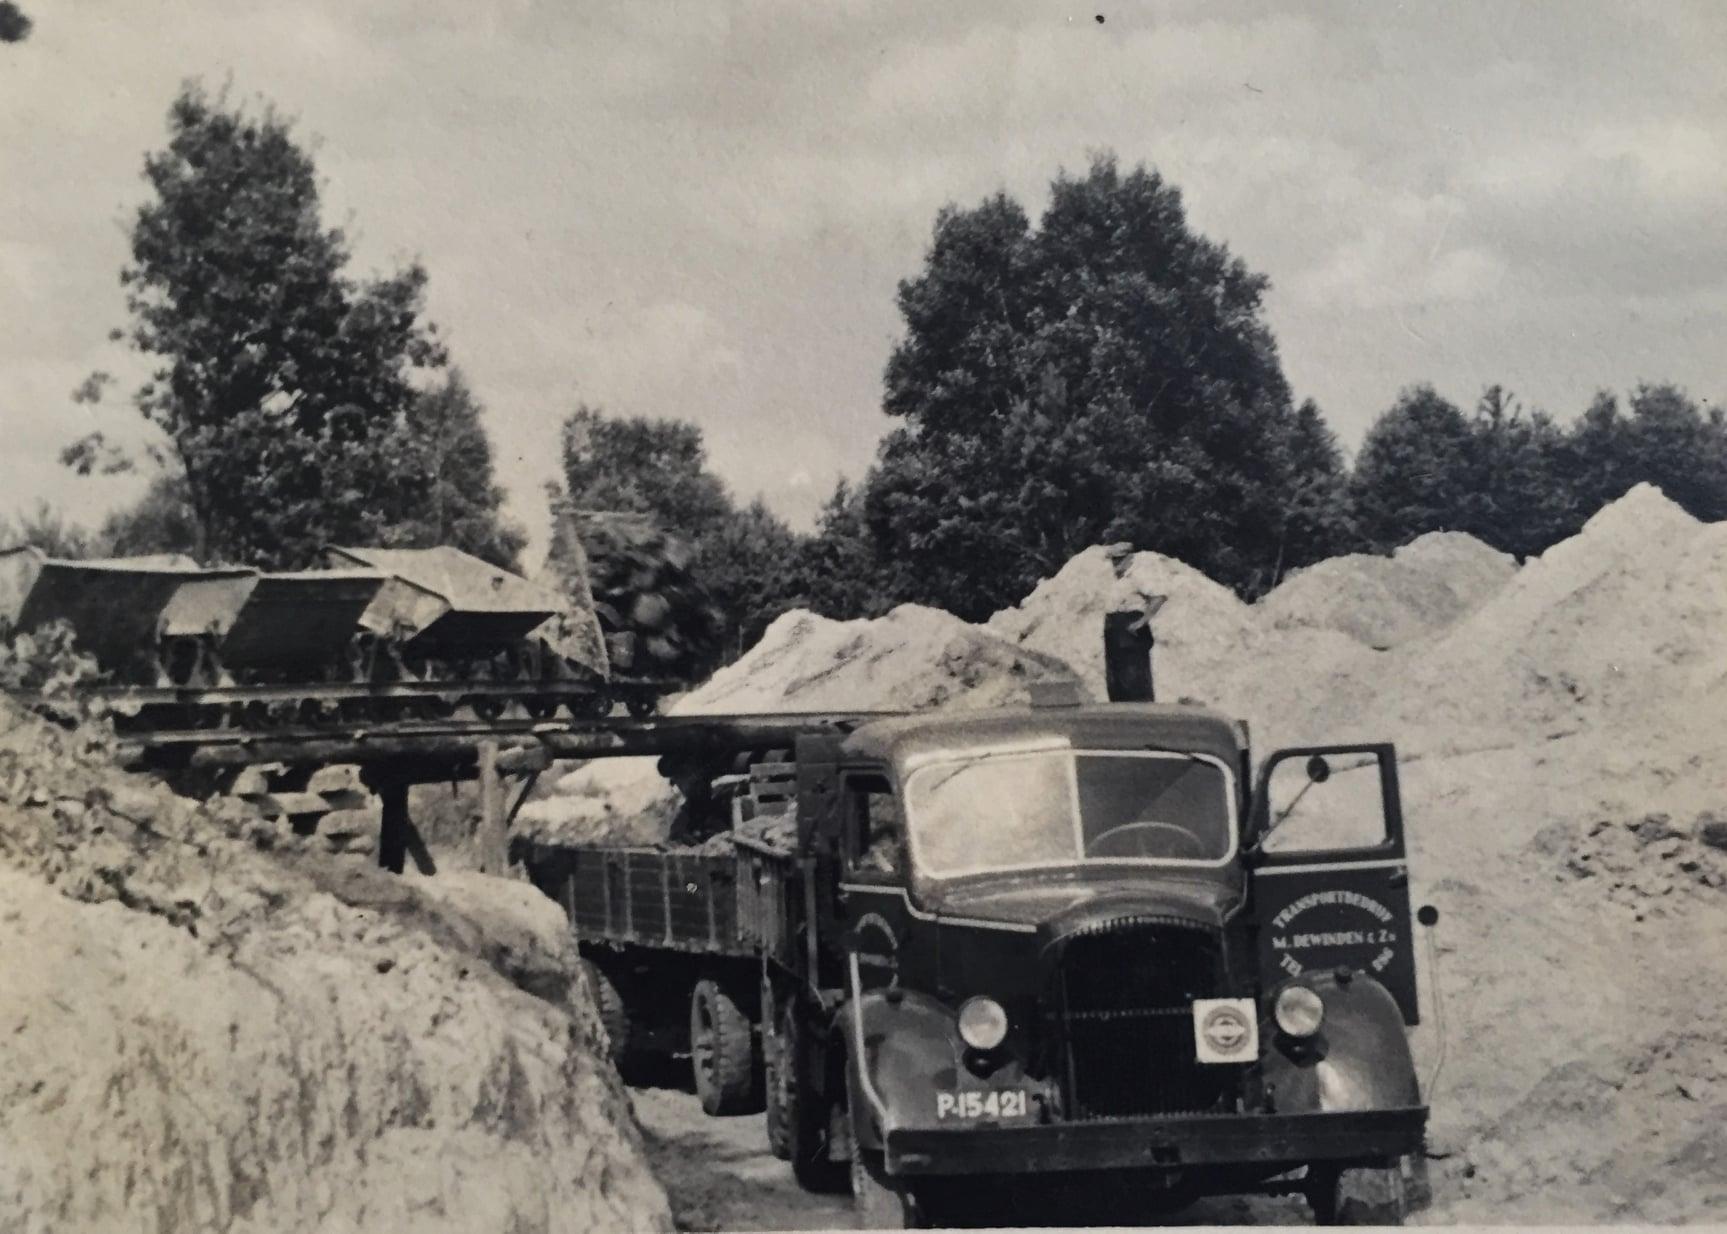 1950-Teeuwen-Brunssum-Sjeng-DeWinden